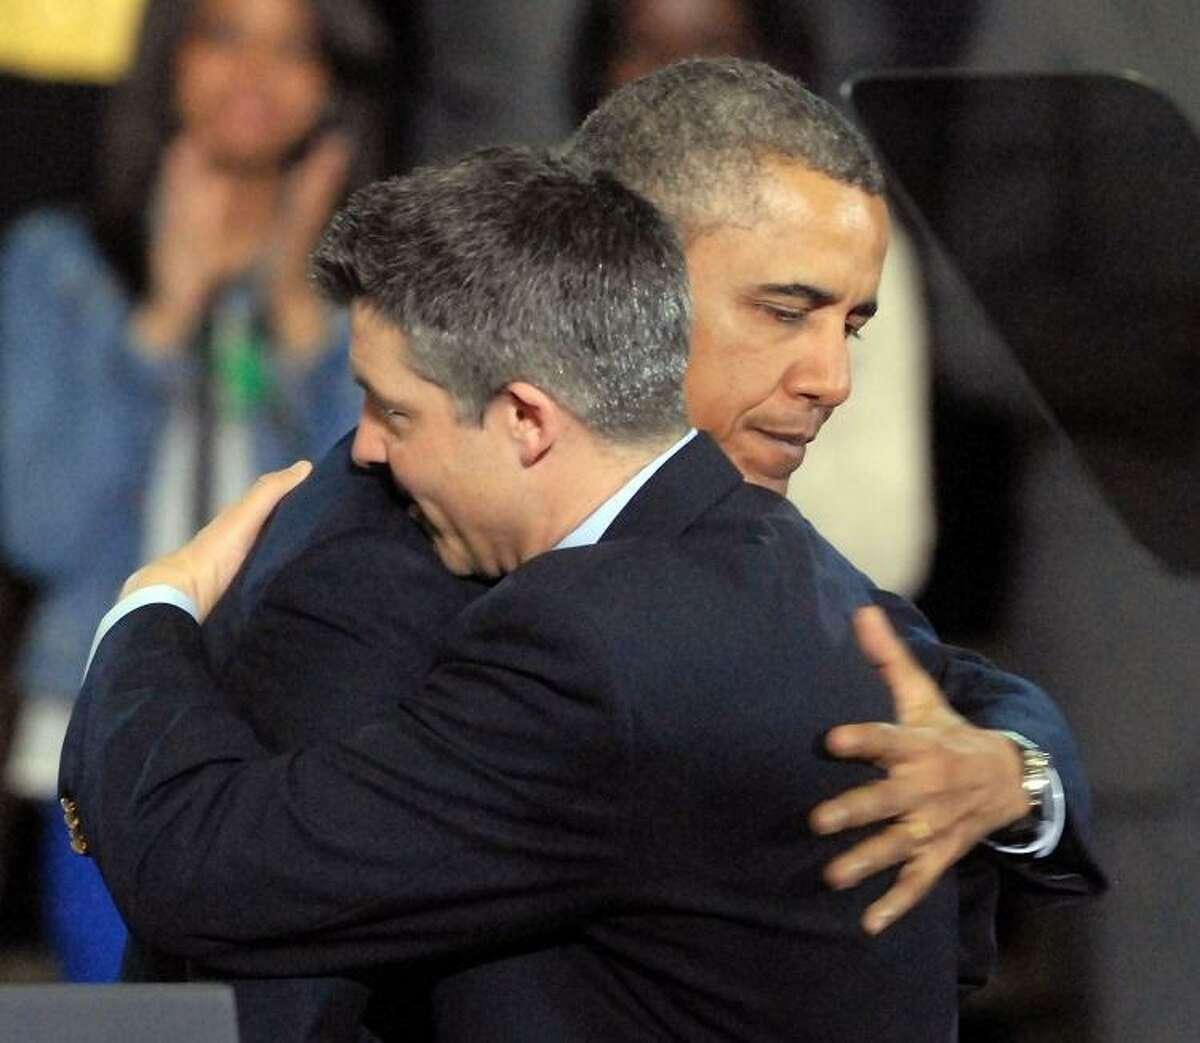 University of Hartford, West Hartford: President Barack Obama hugs Ian Hockley, father of Dylan, before Obama was to speak on gun control. Mara Lavitt/New Haven Register4/8/13